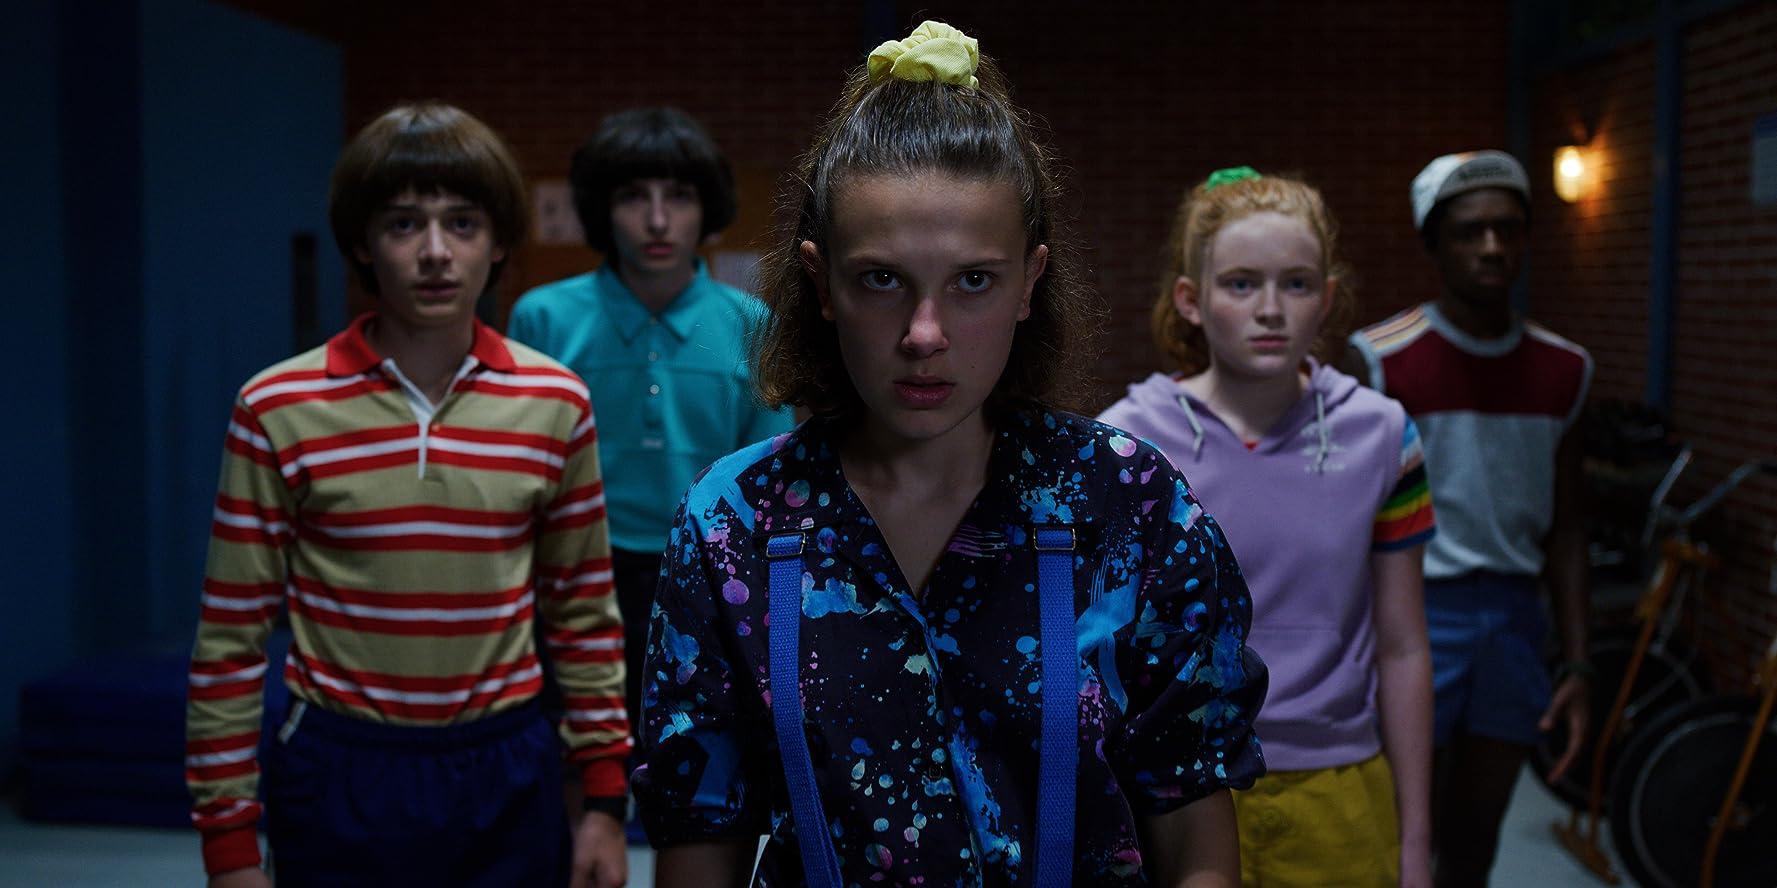 recenzija horor serija, recenzija horor film, stranger things season 3